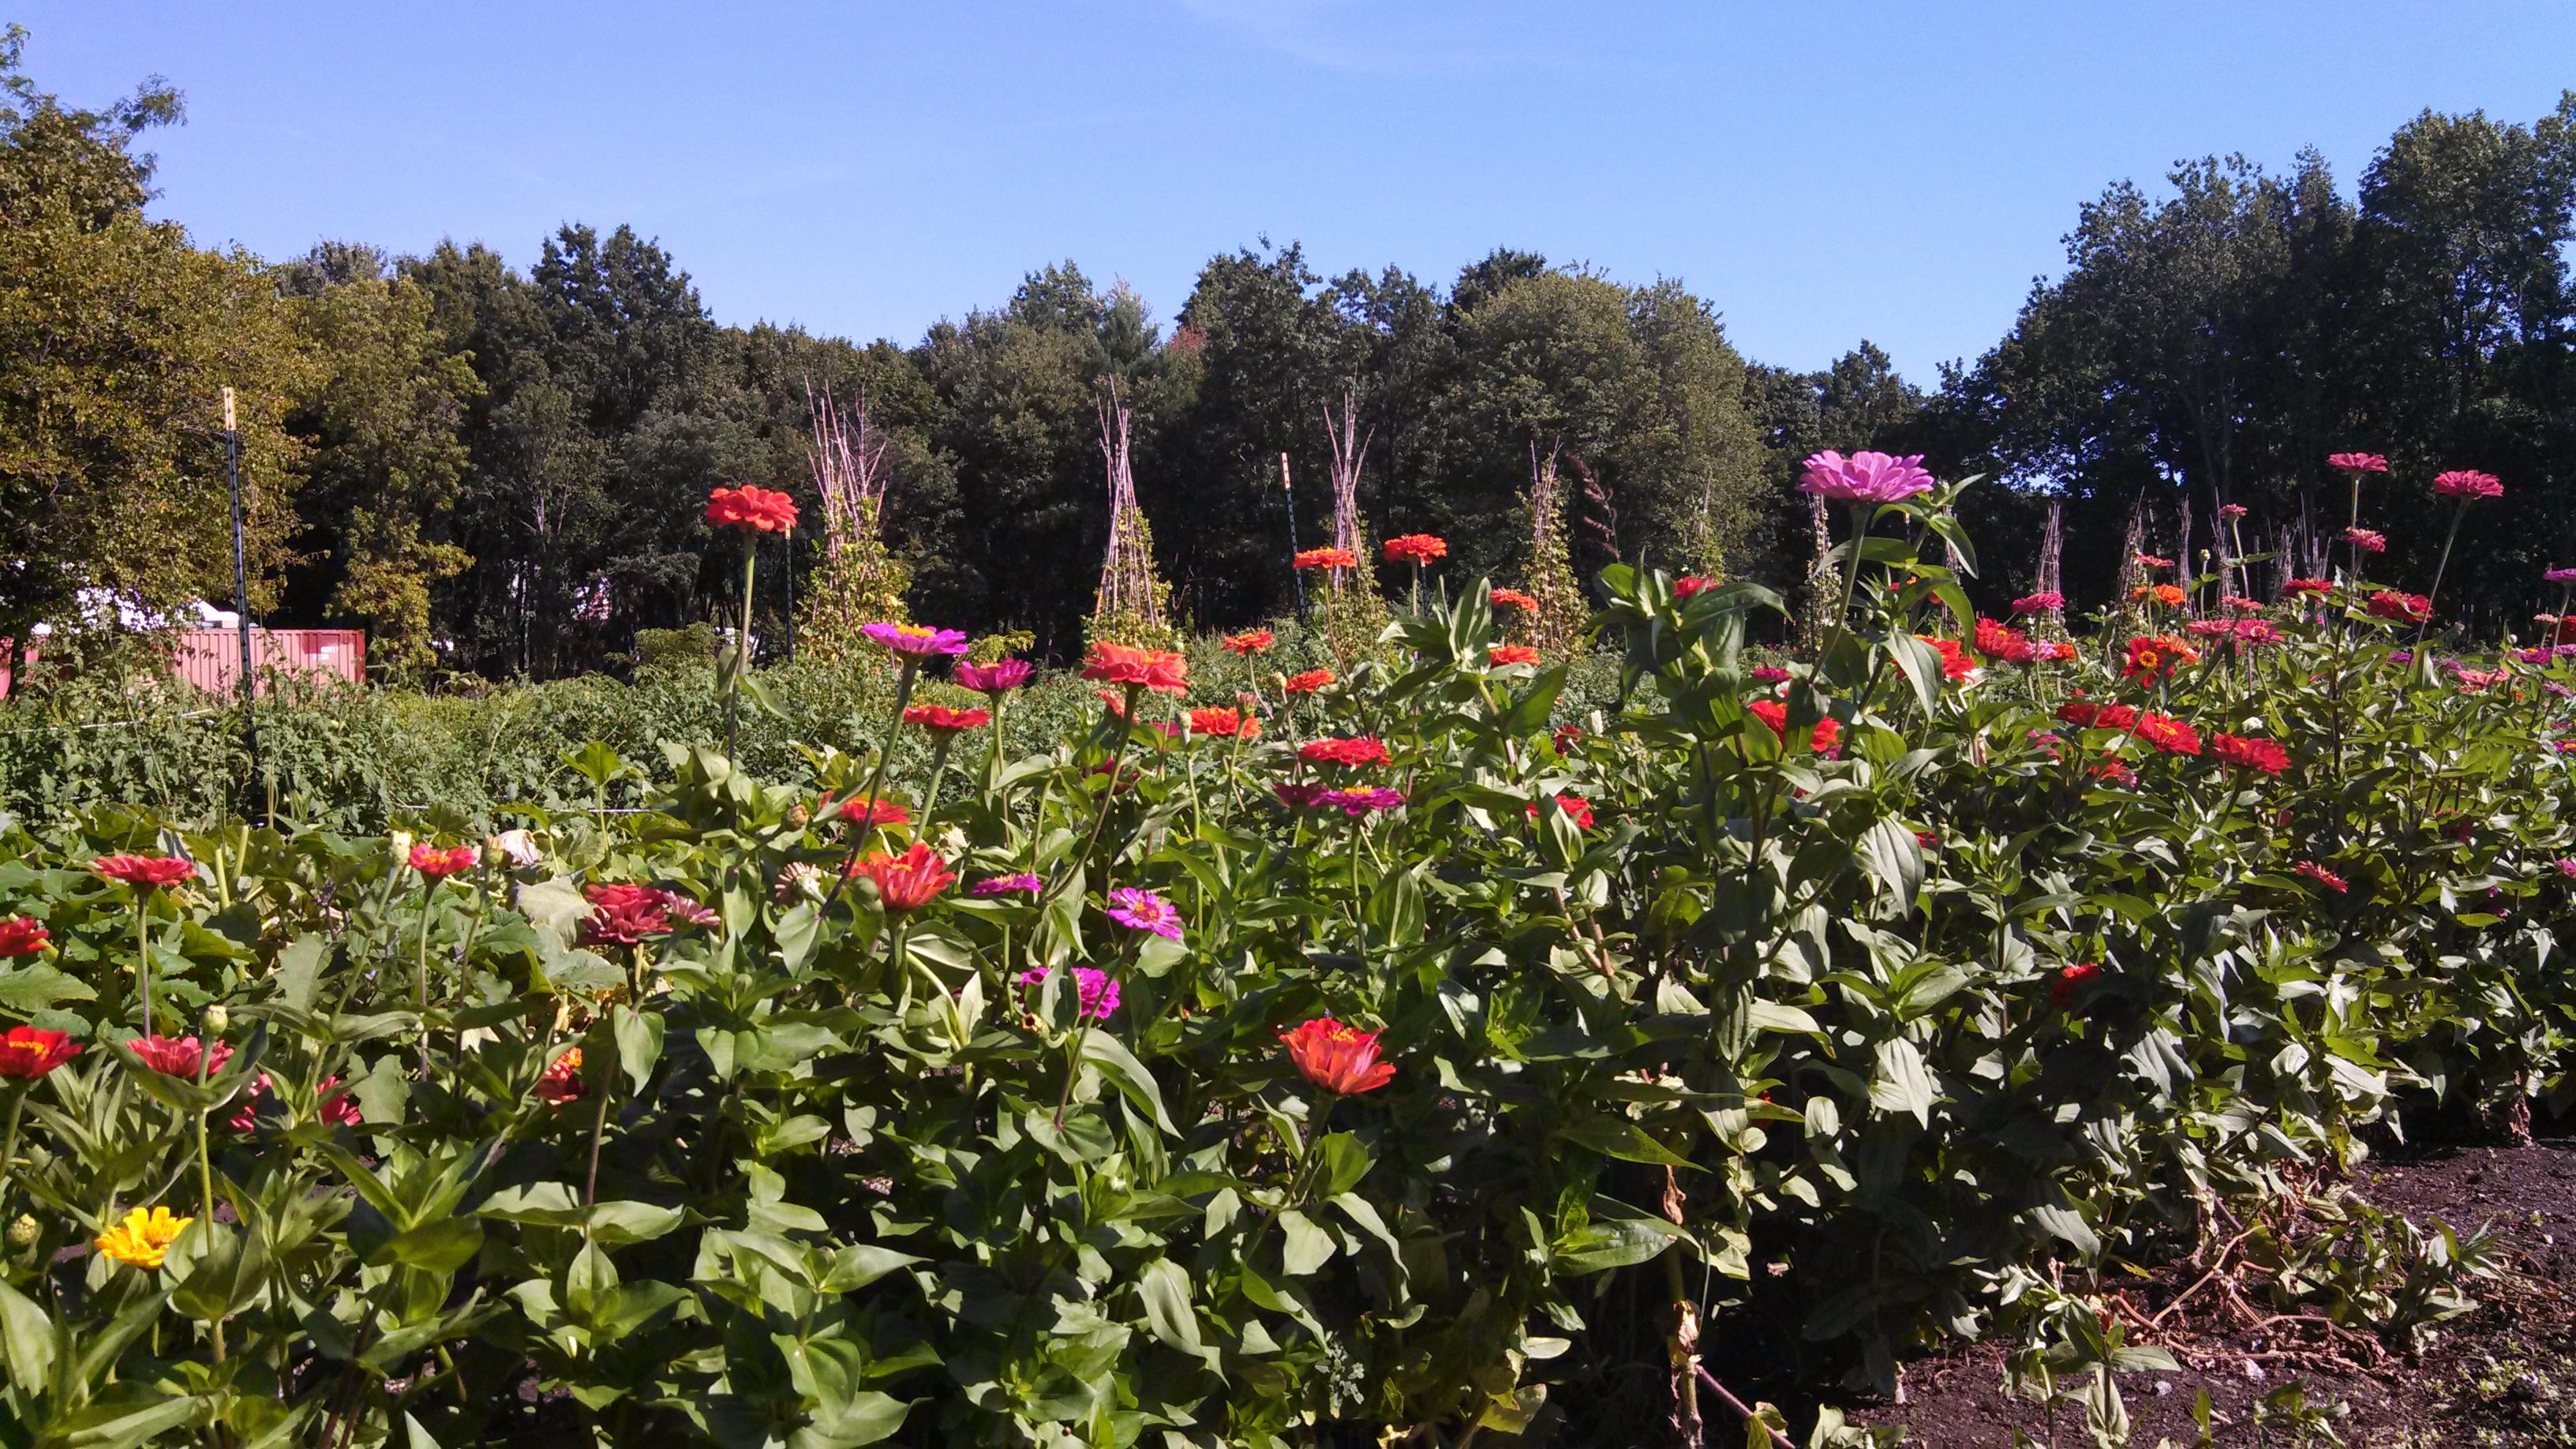 heritage farm photo by veronica hackethal - Staten Island Botanical Garden